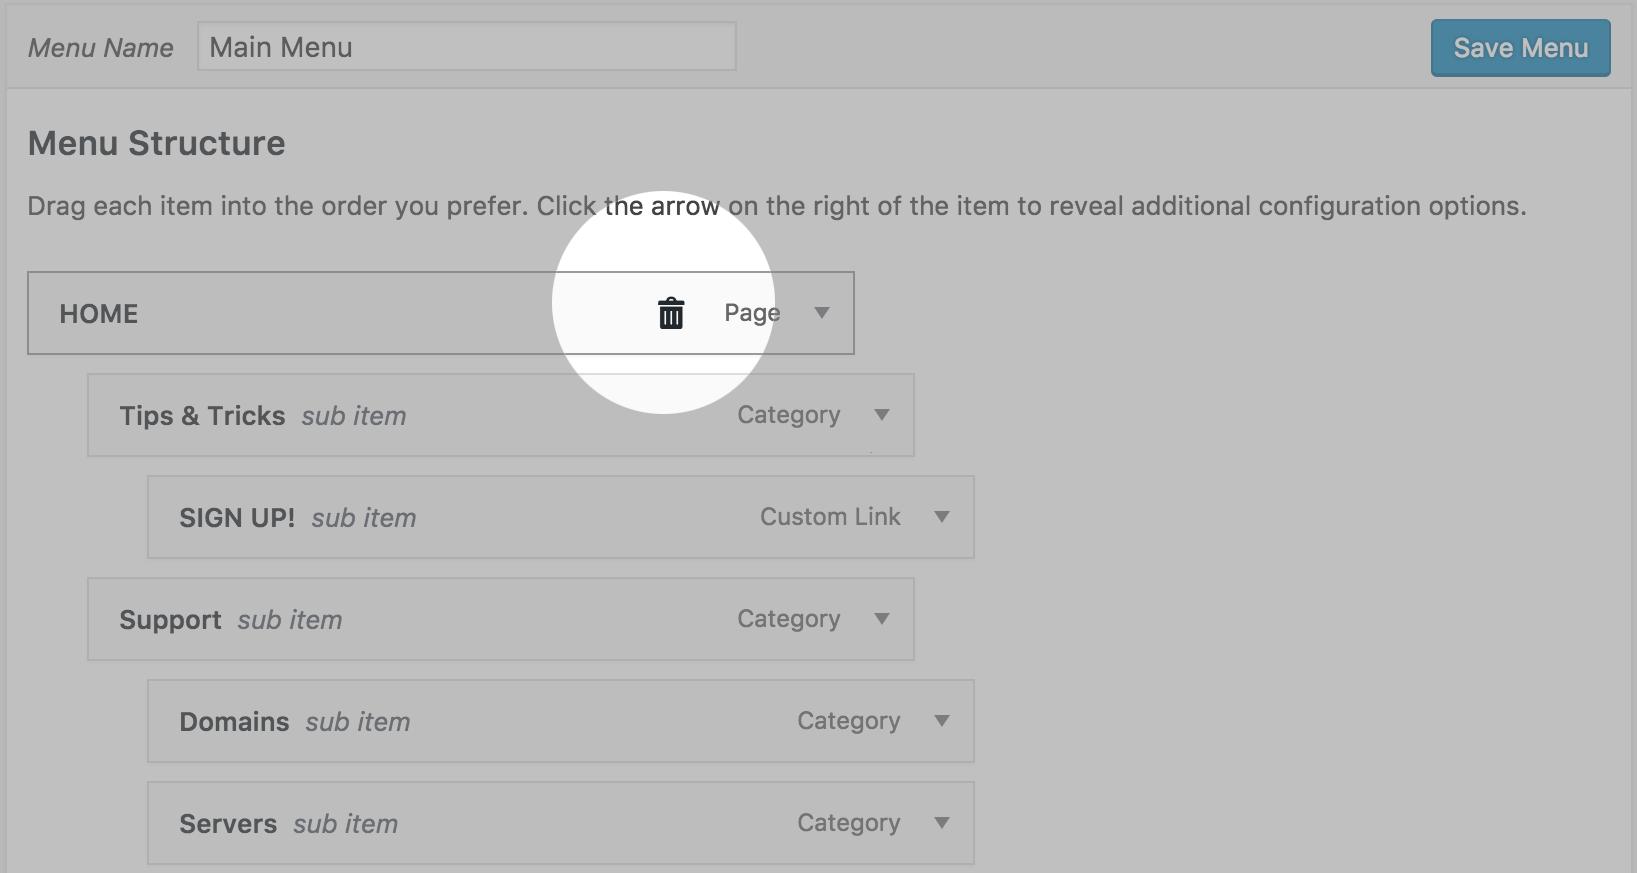 Demo one click remove menu item.